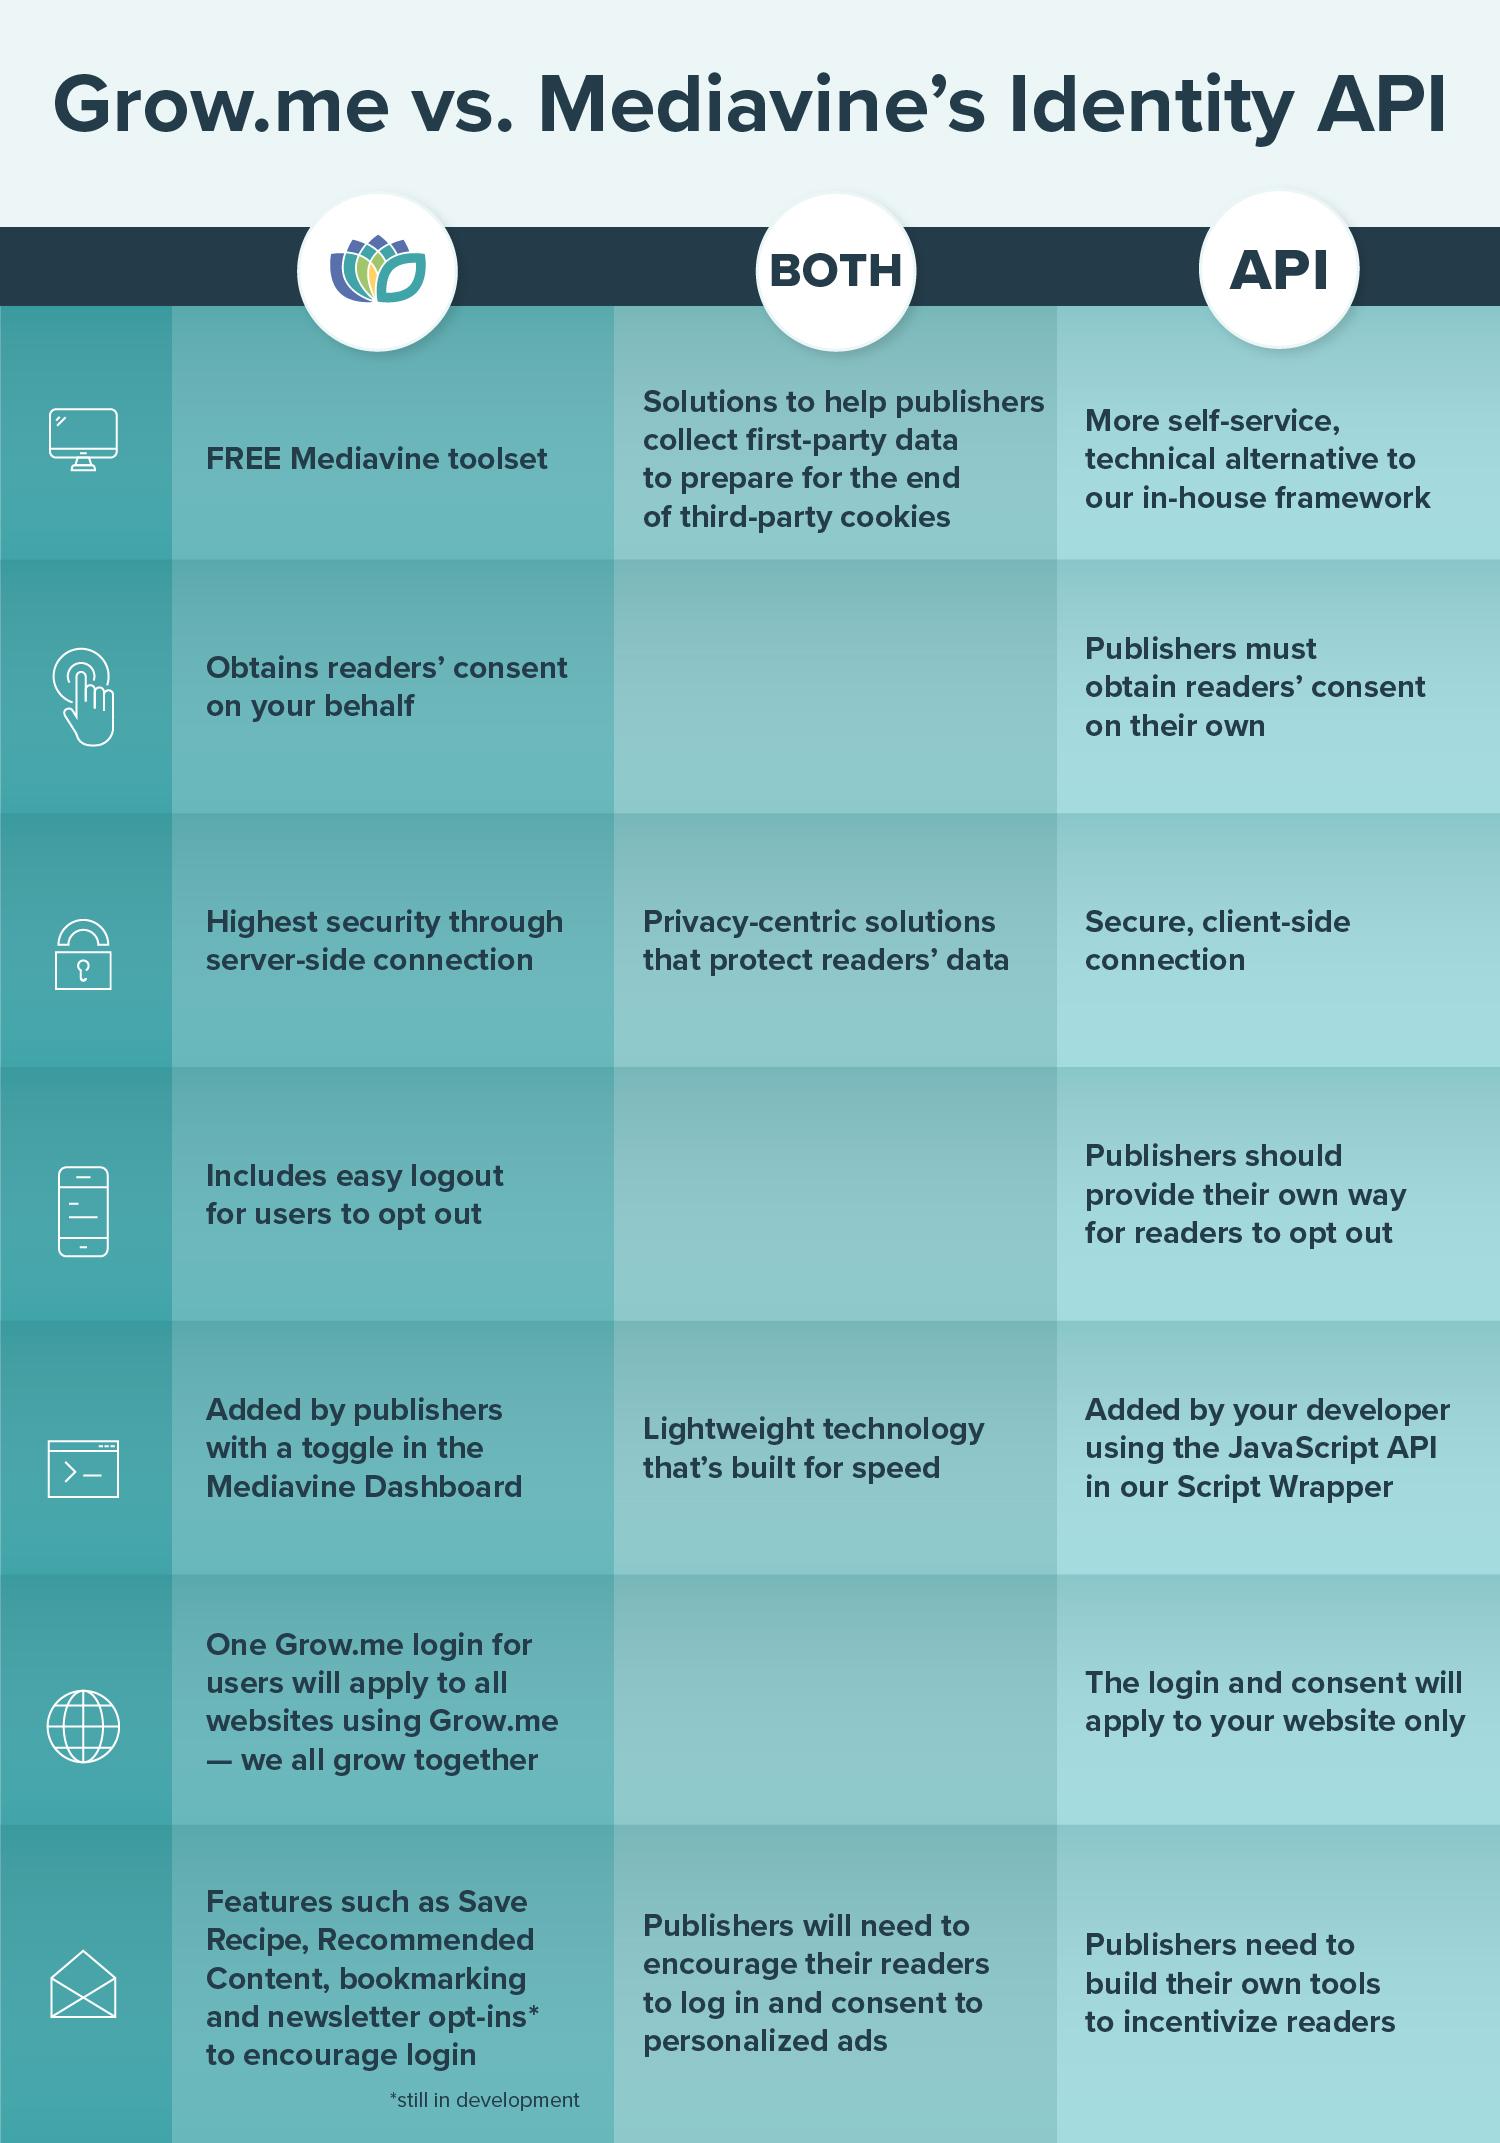 infographic comparing grow.me to mediavine's identity API